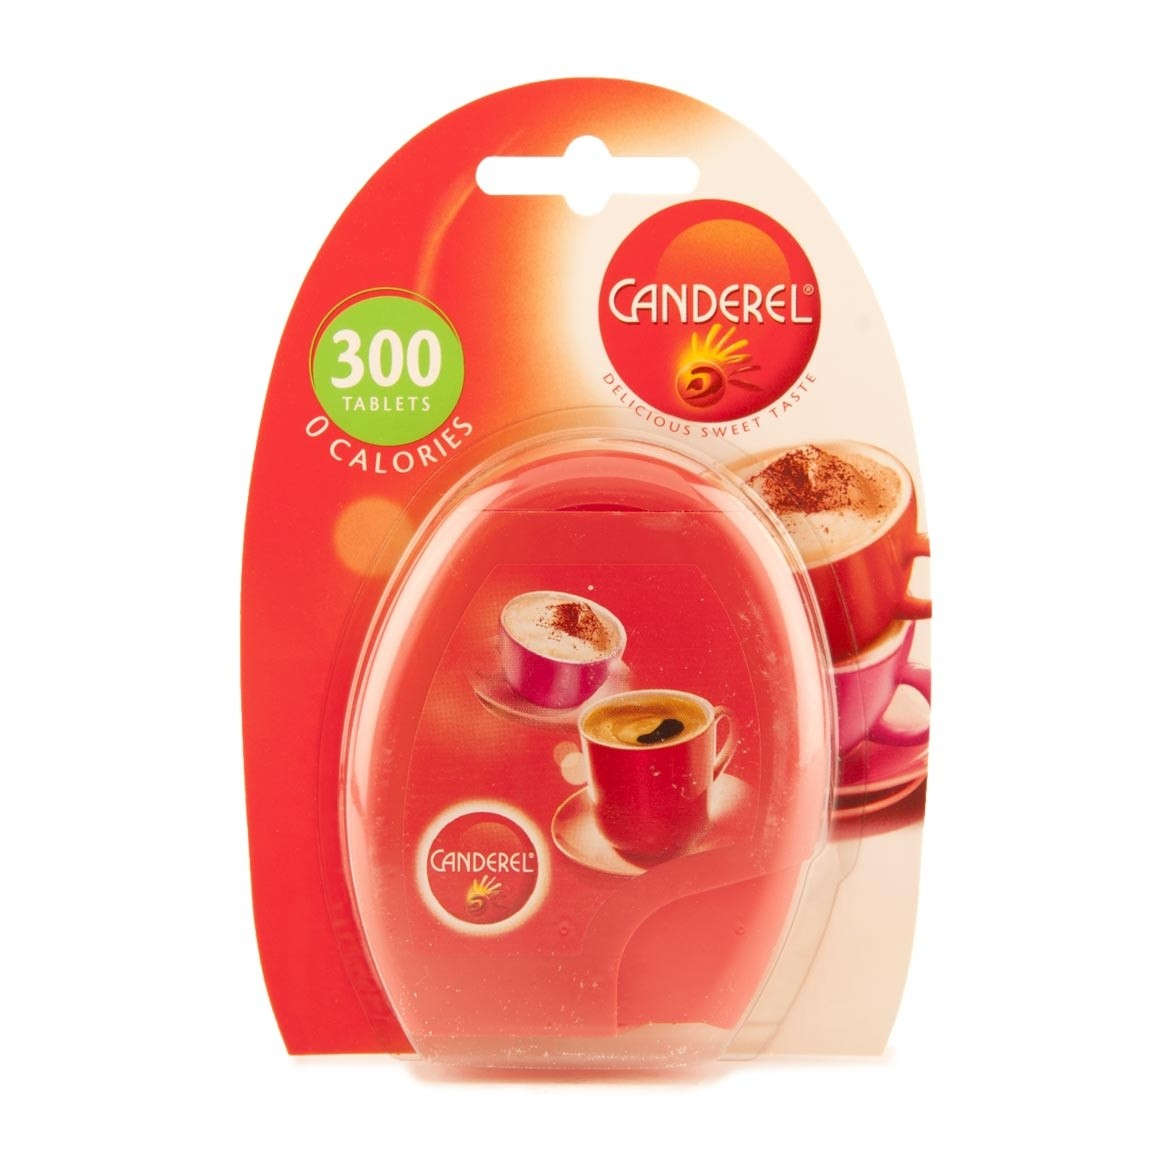 Canderel Tablets 300's